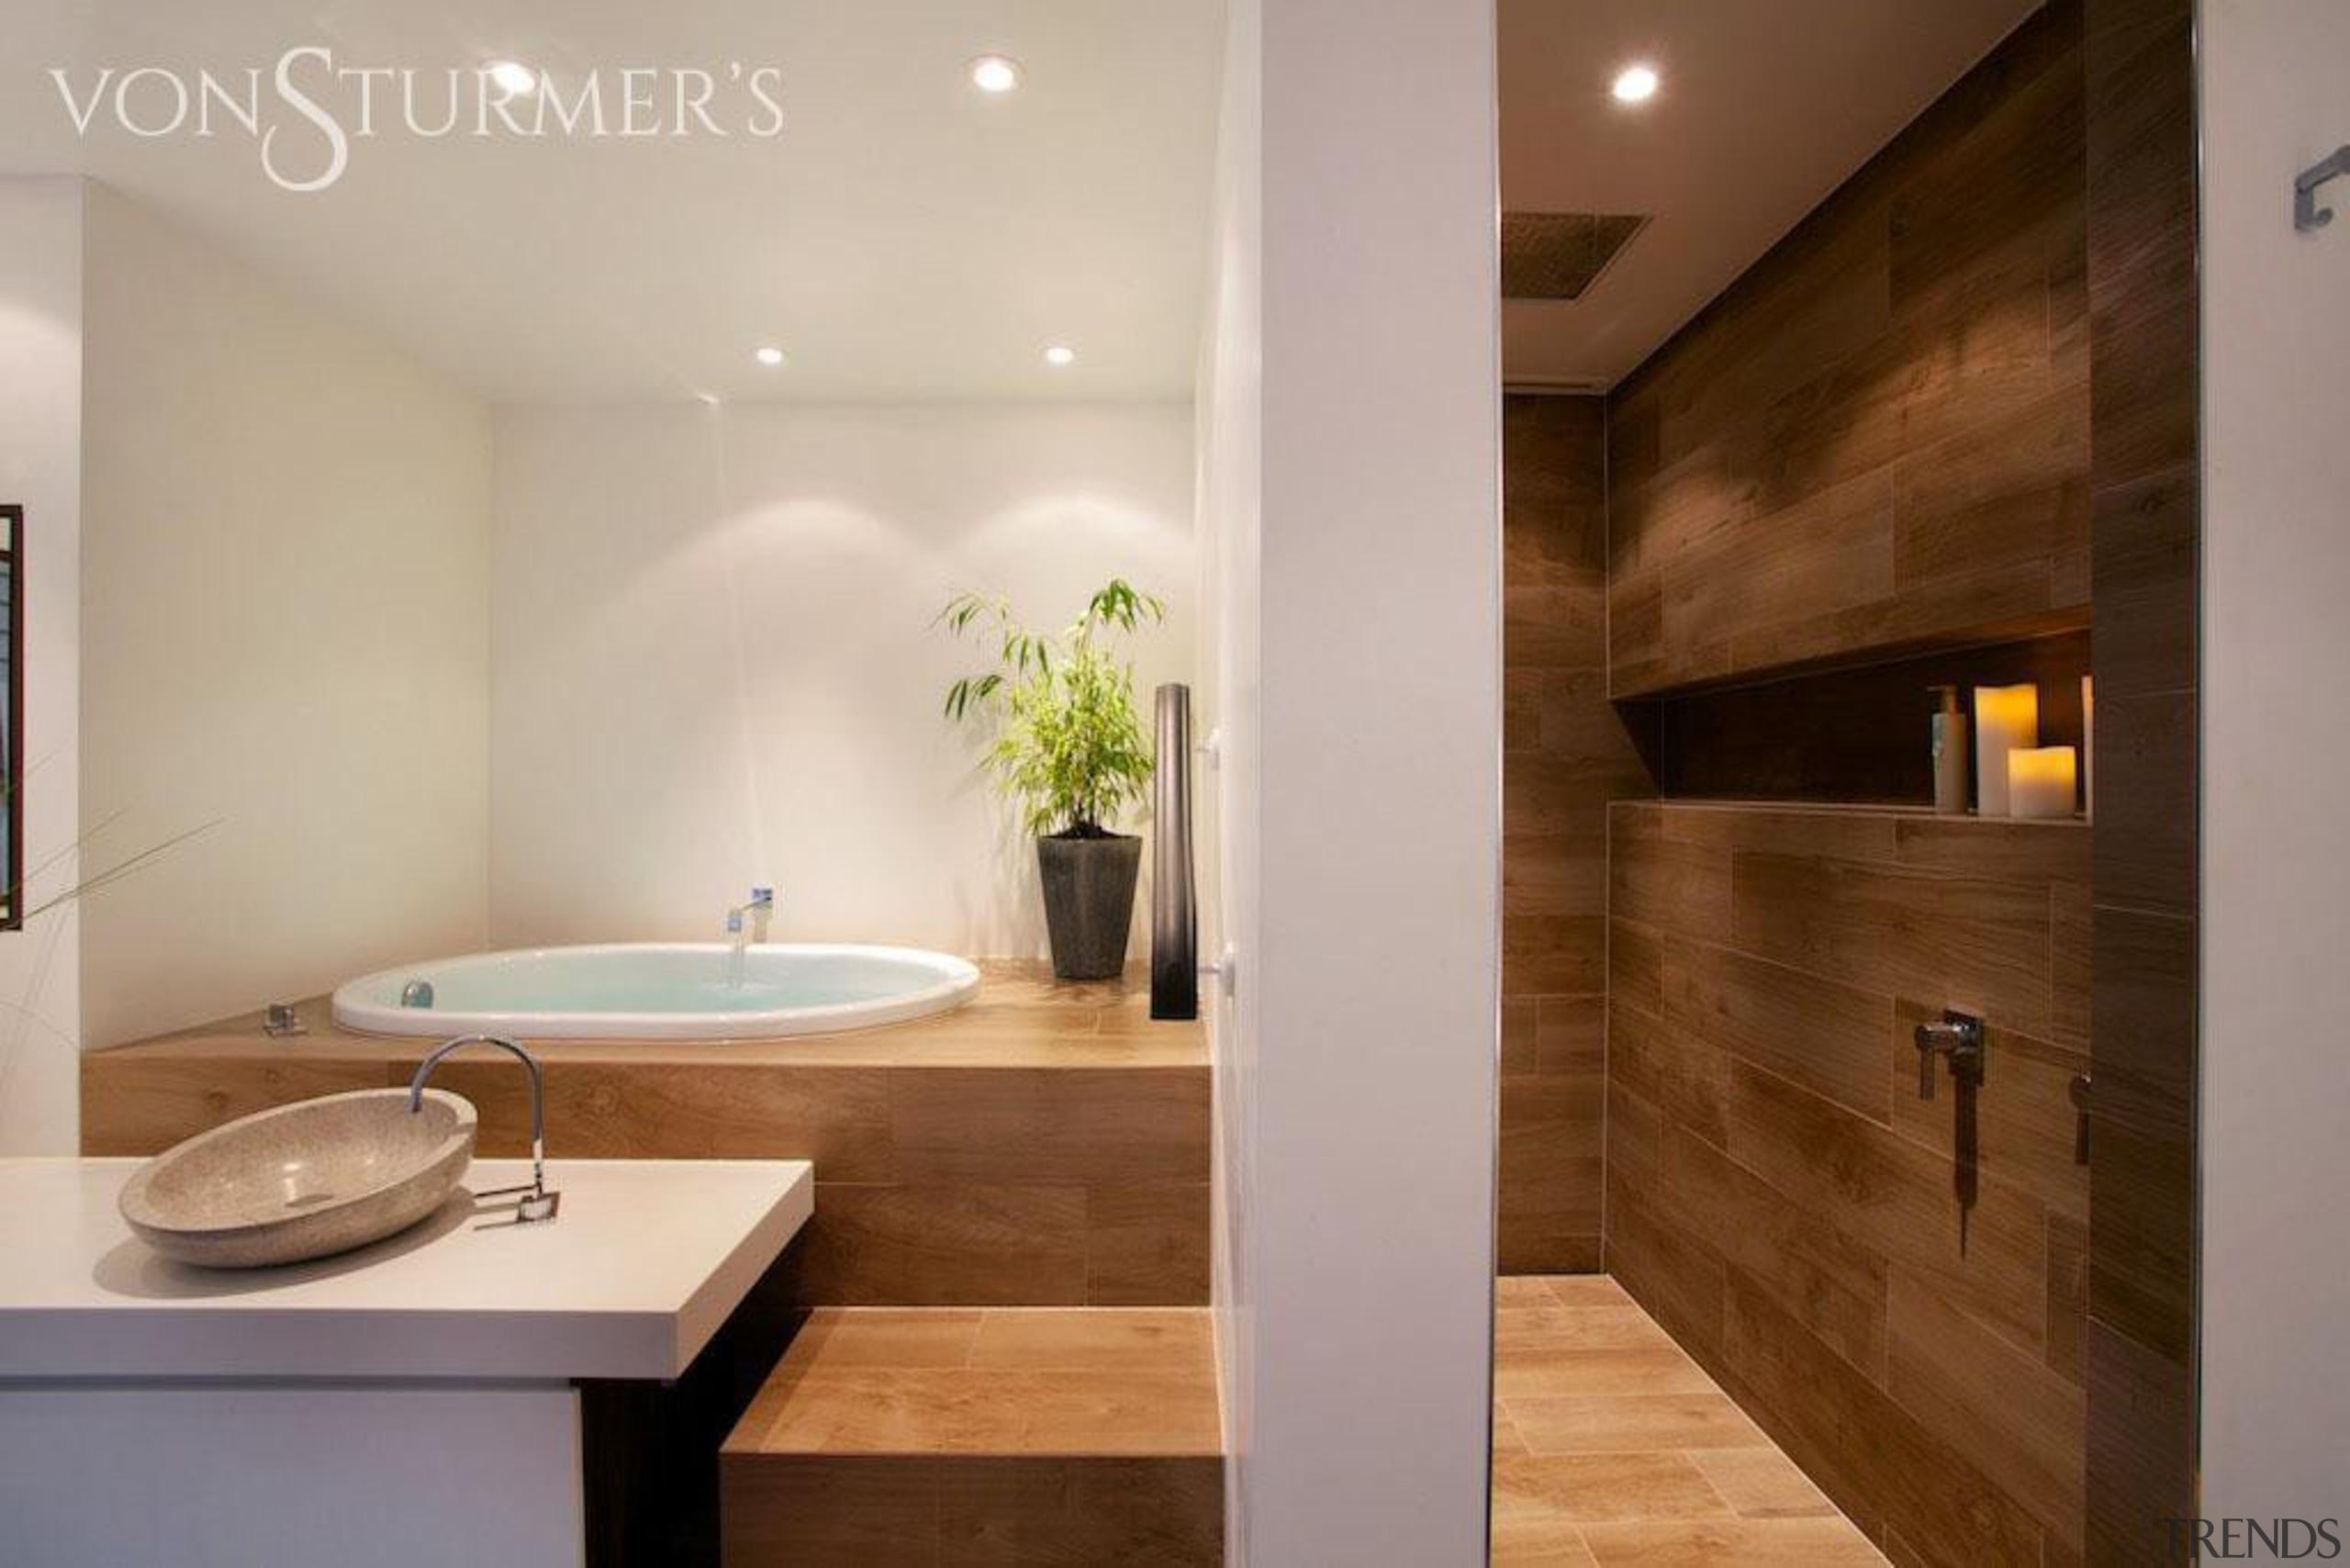 Etic wood look tiles - Etic wood look architecture, bathroom, ceiling, countertop, floor, flooring, home, interior design, property, real estate, room, sink, gray, brown